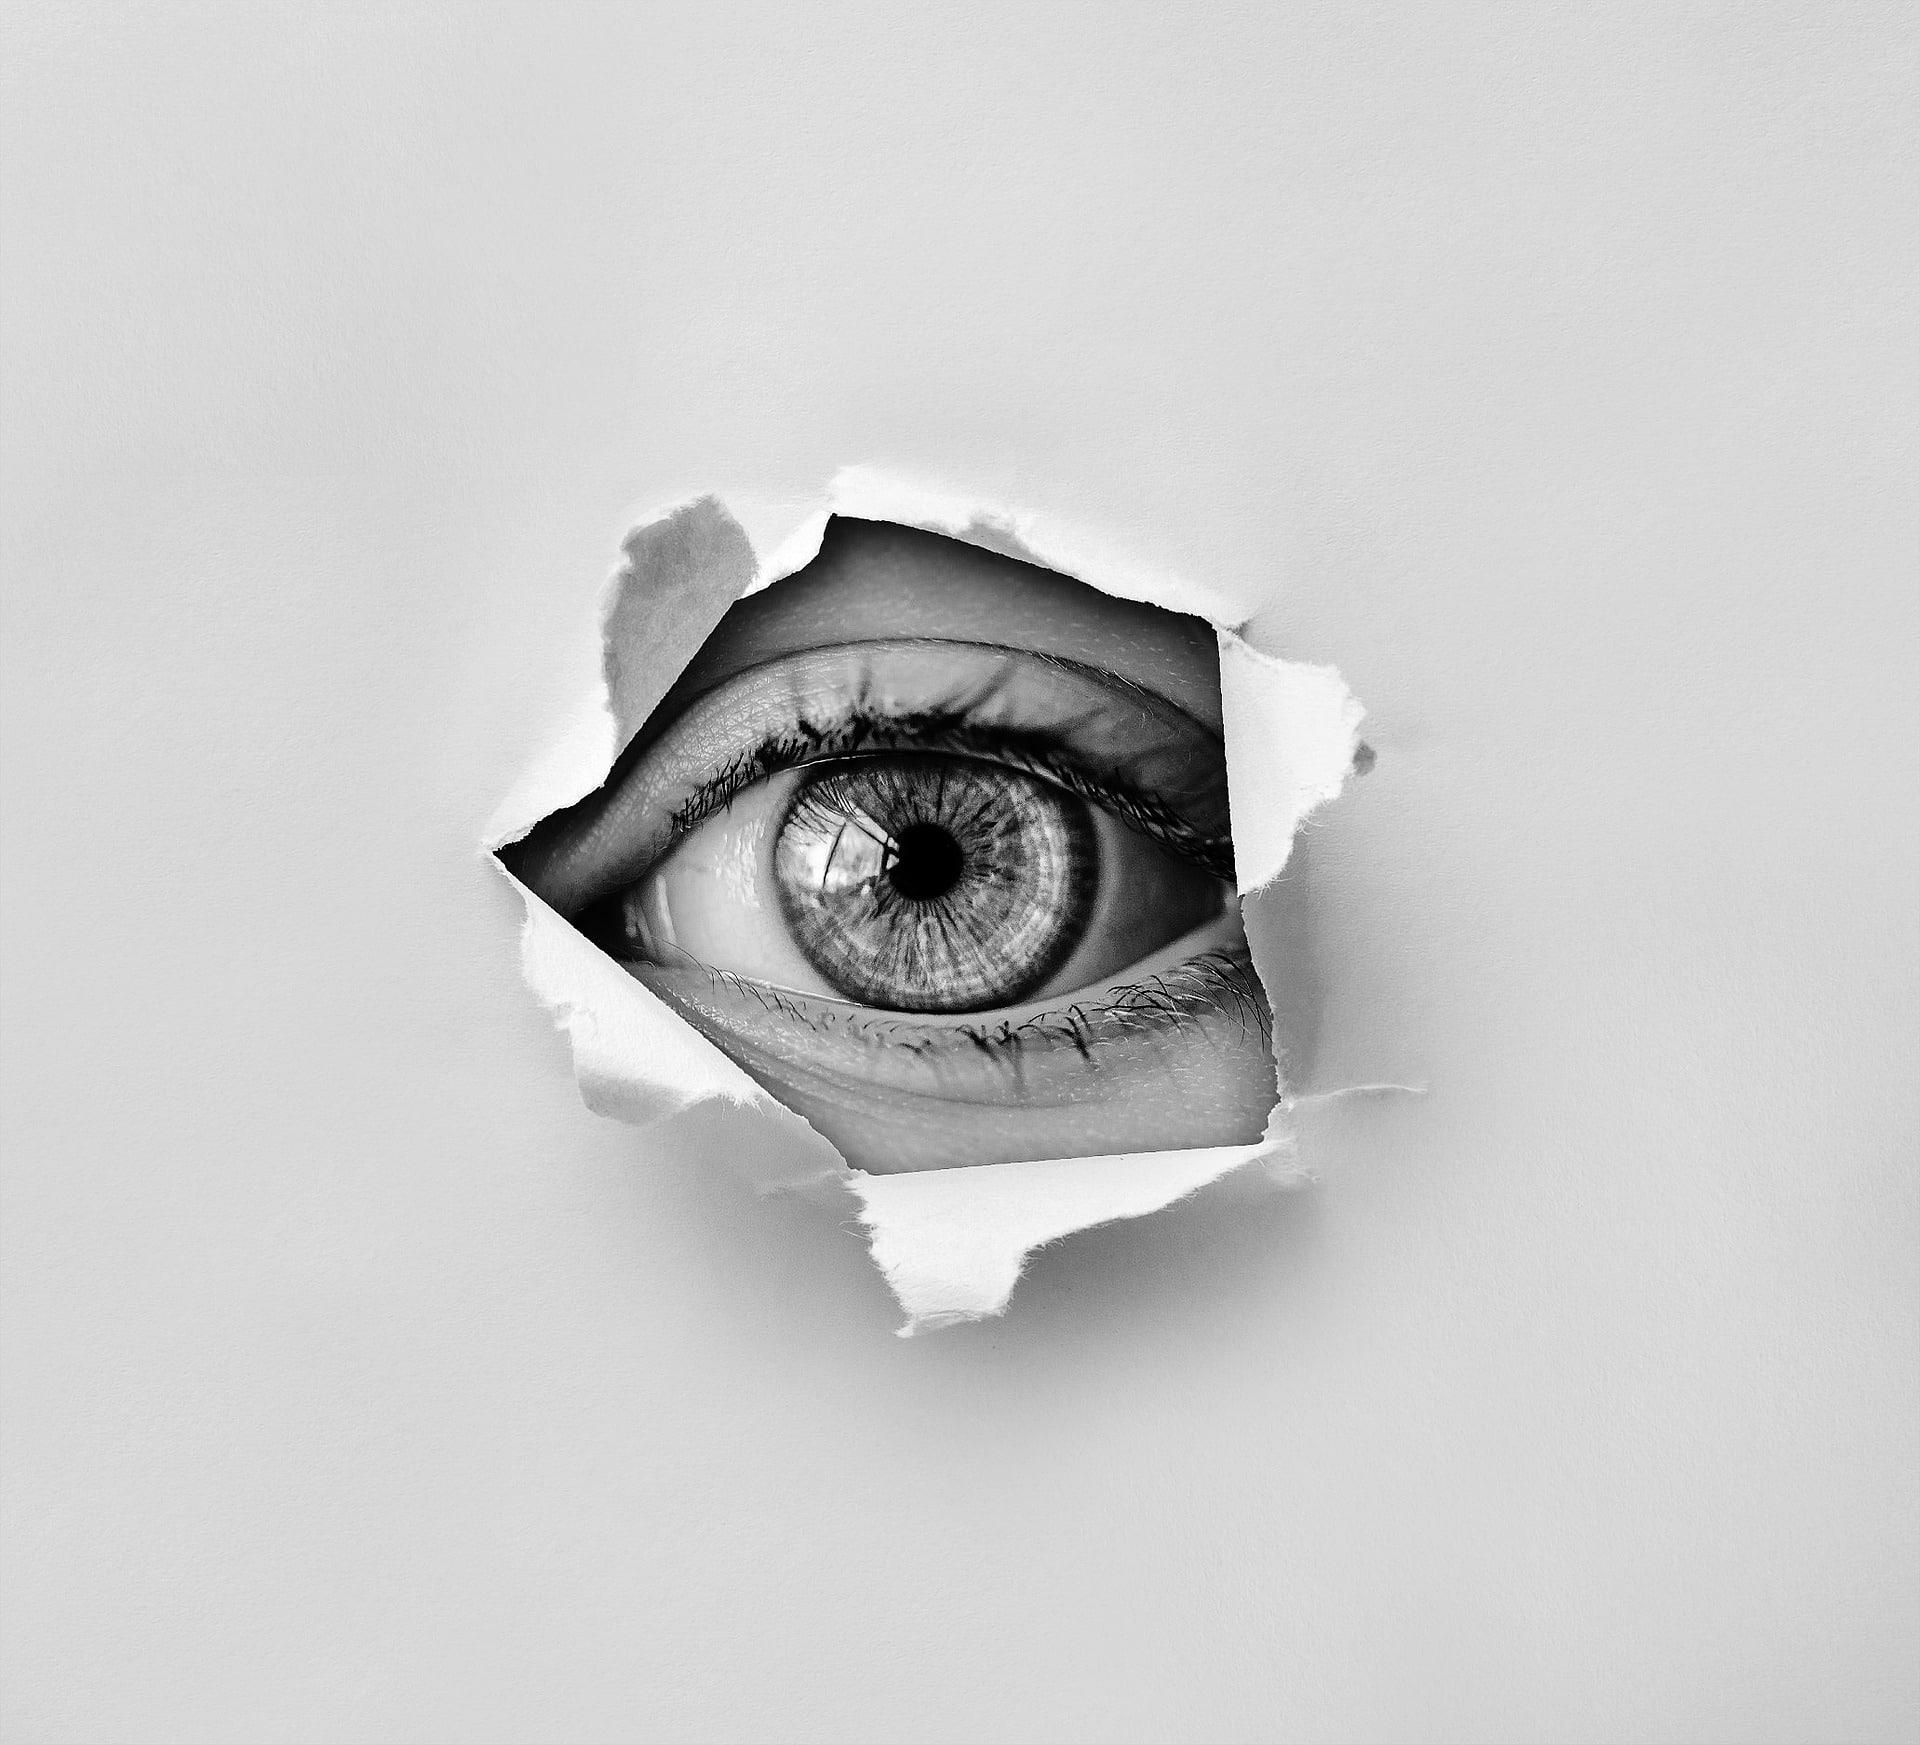 HomeKit Kameras: Fühlt ihr euch beobachtet?